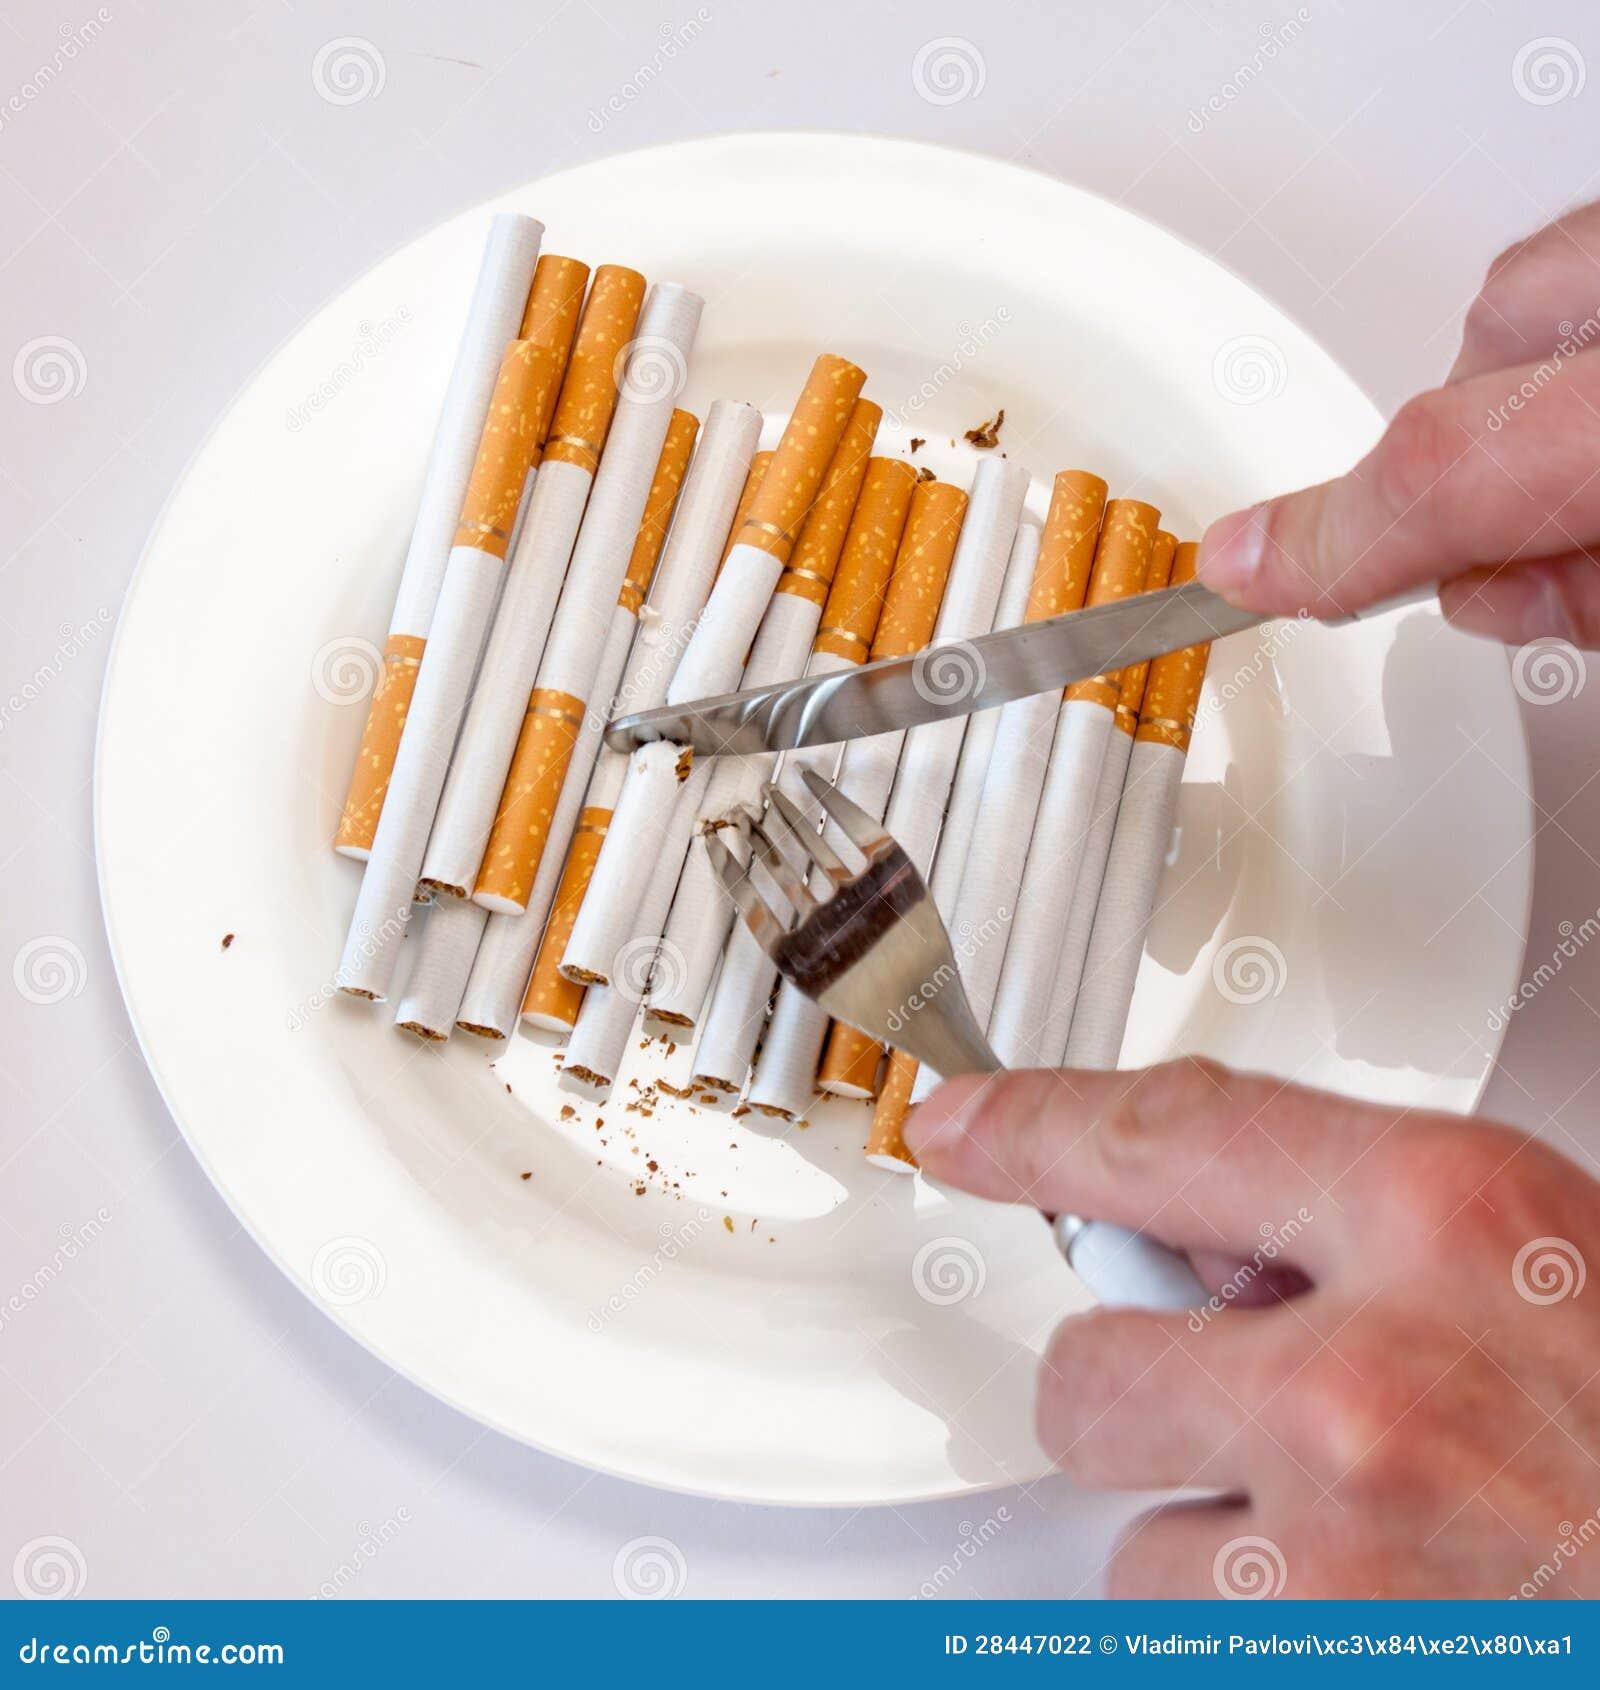 Burden of Tobacco Use in the U.S.